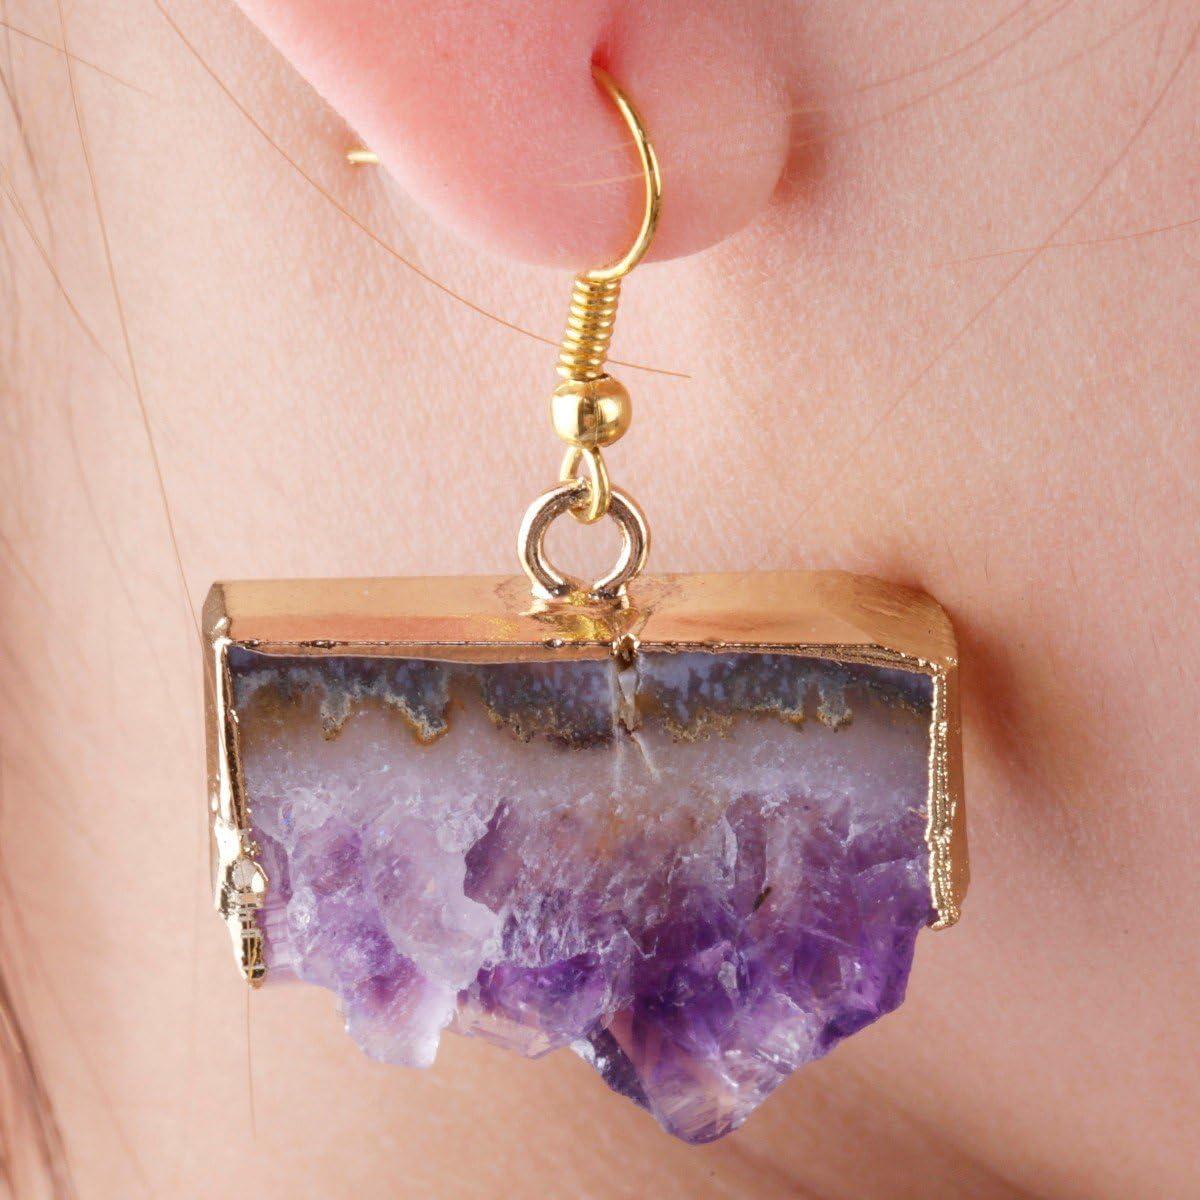 SUNYIK Natural Gemstone Quartz Geode Drusy Crystal Dangle Earrings for Women